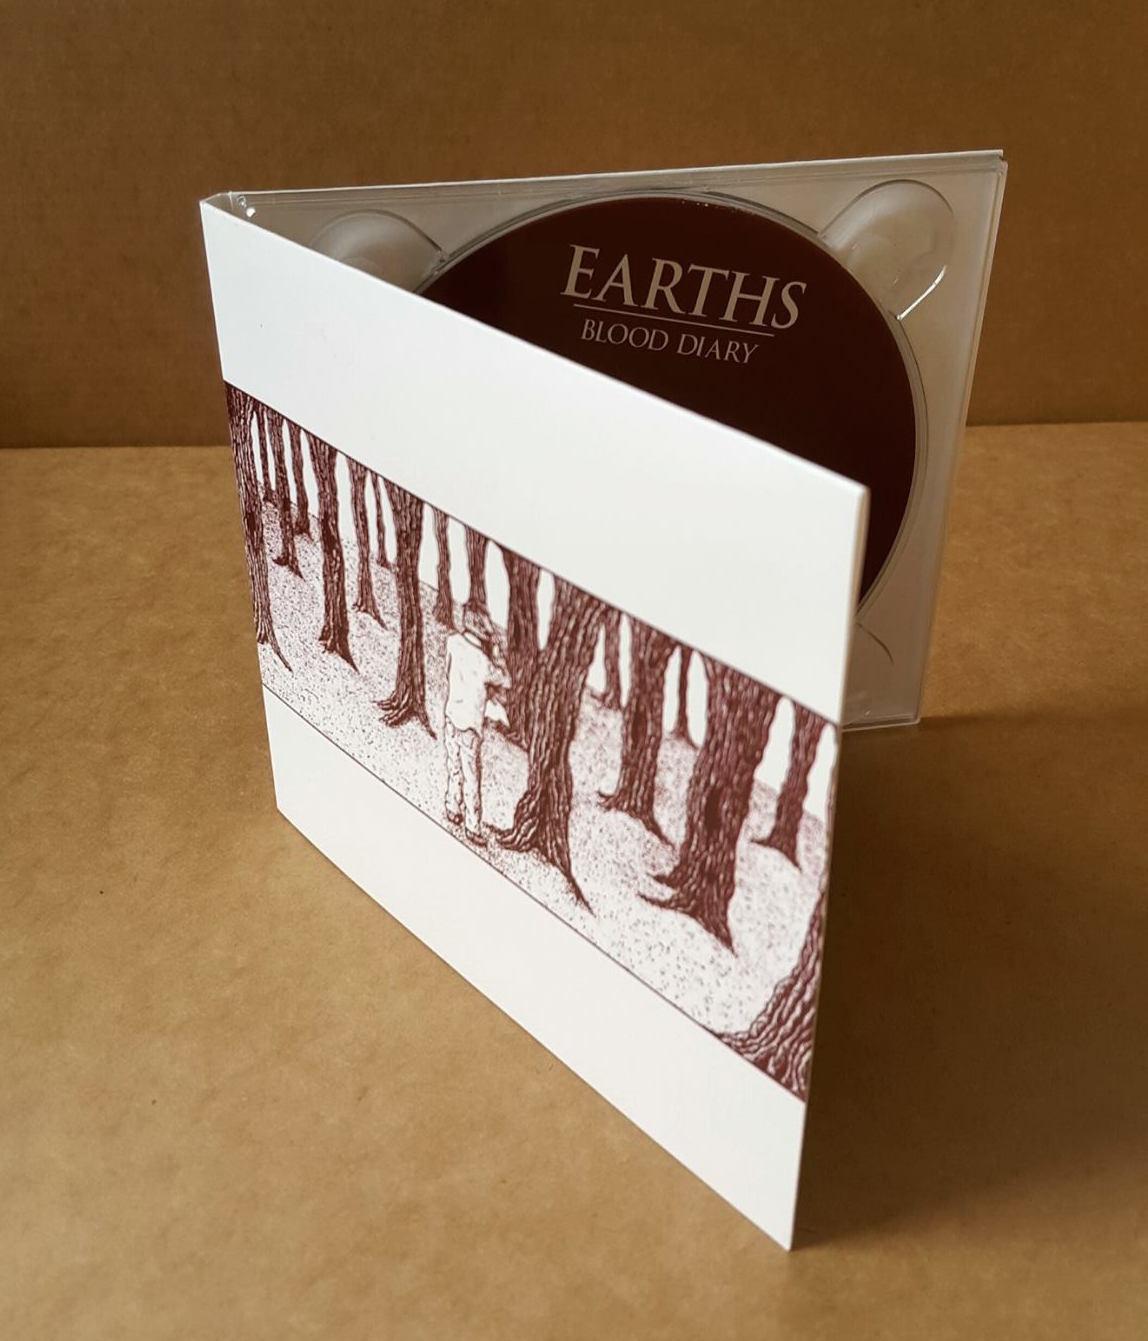 Earths - Blood Diary